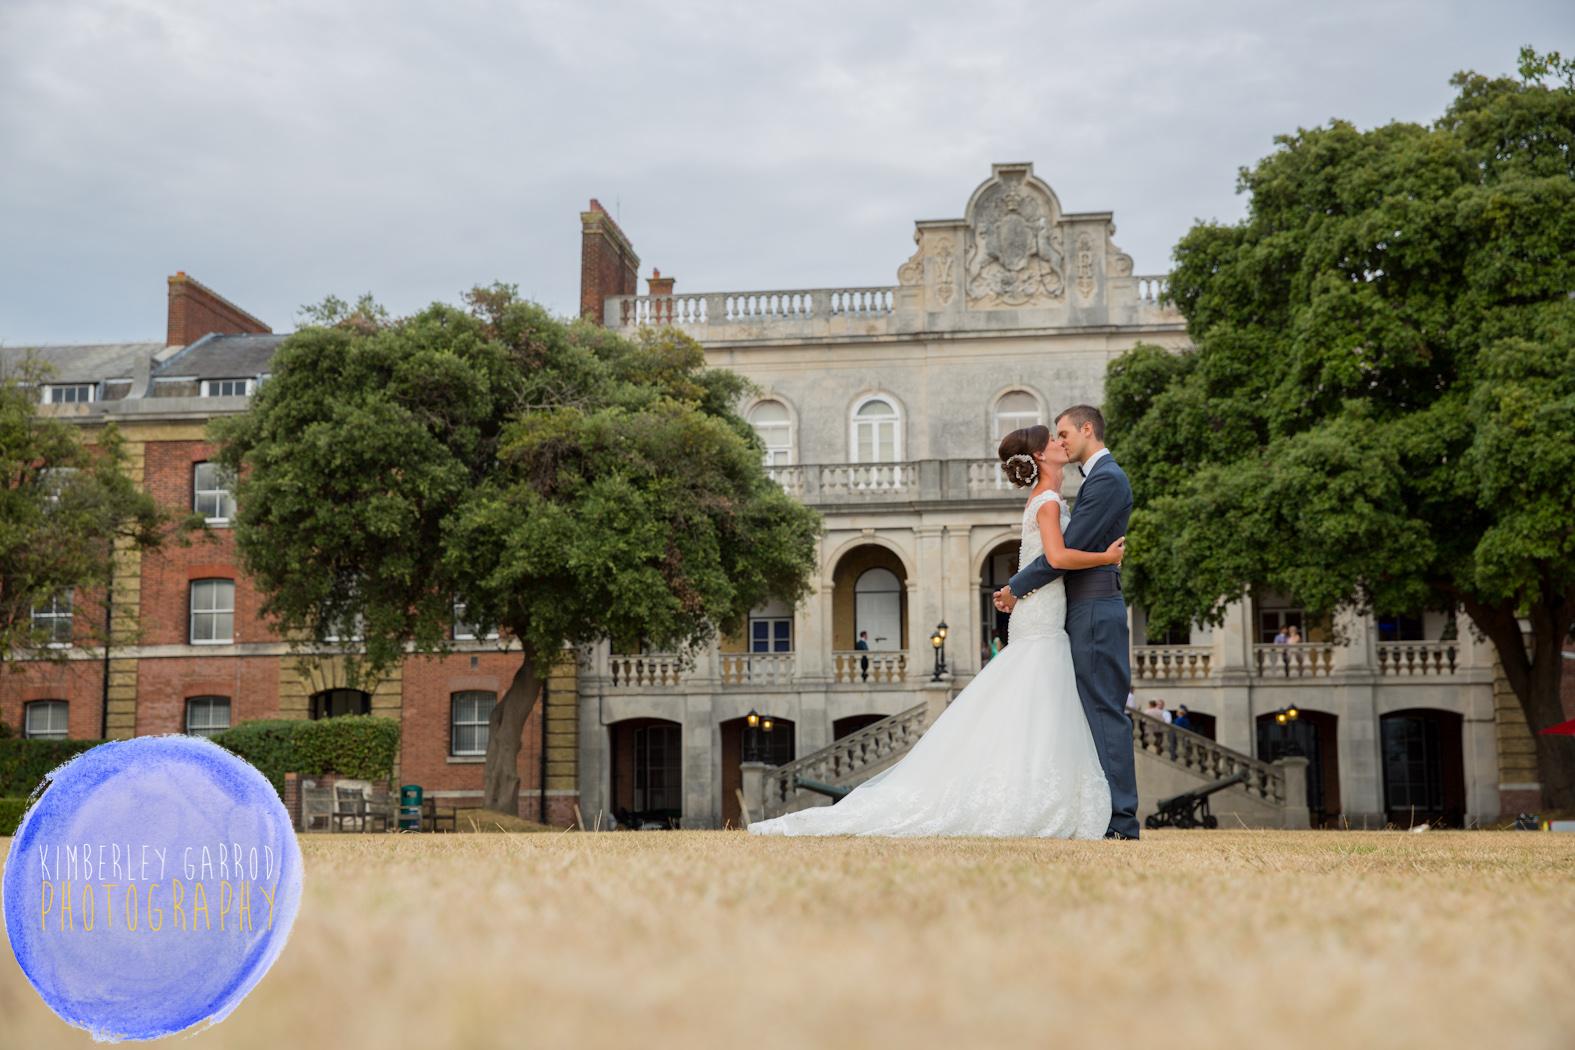 Royal Marines Museum Southsea Wedding Photographer Kimberley Garrod-27